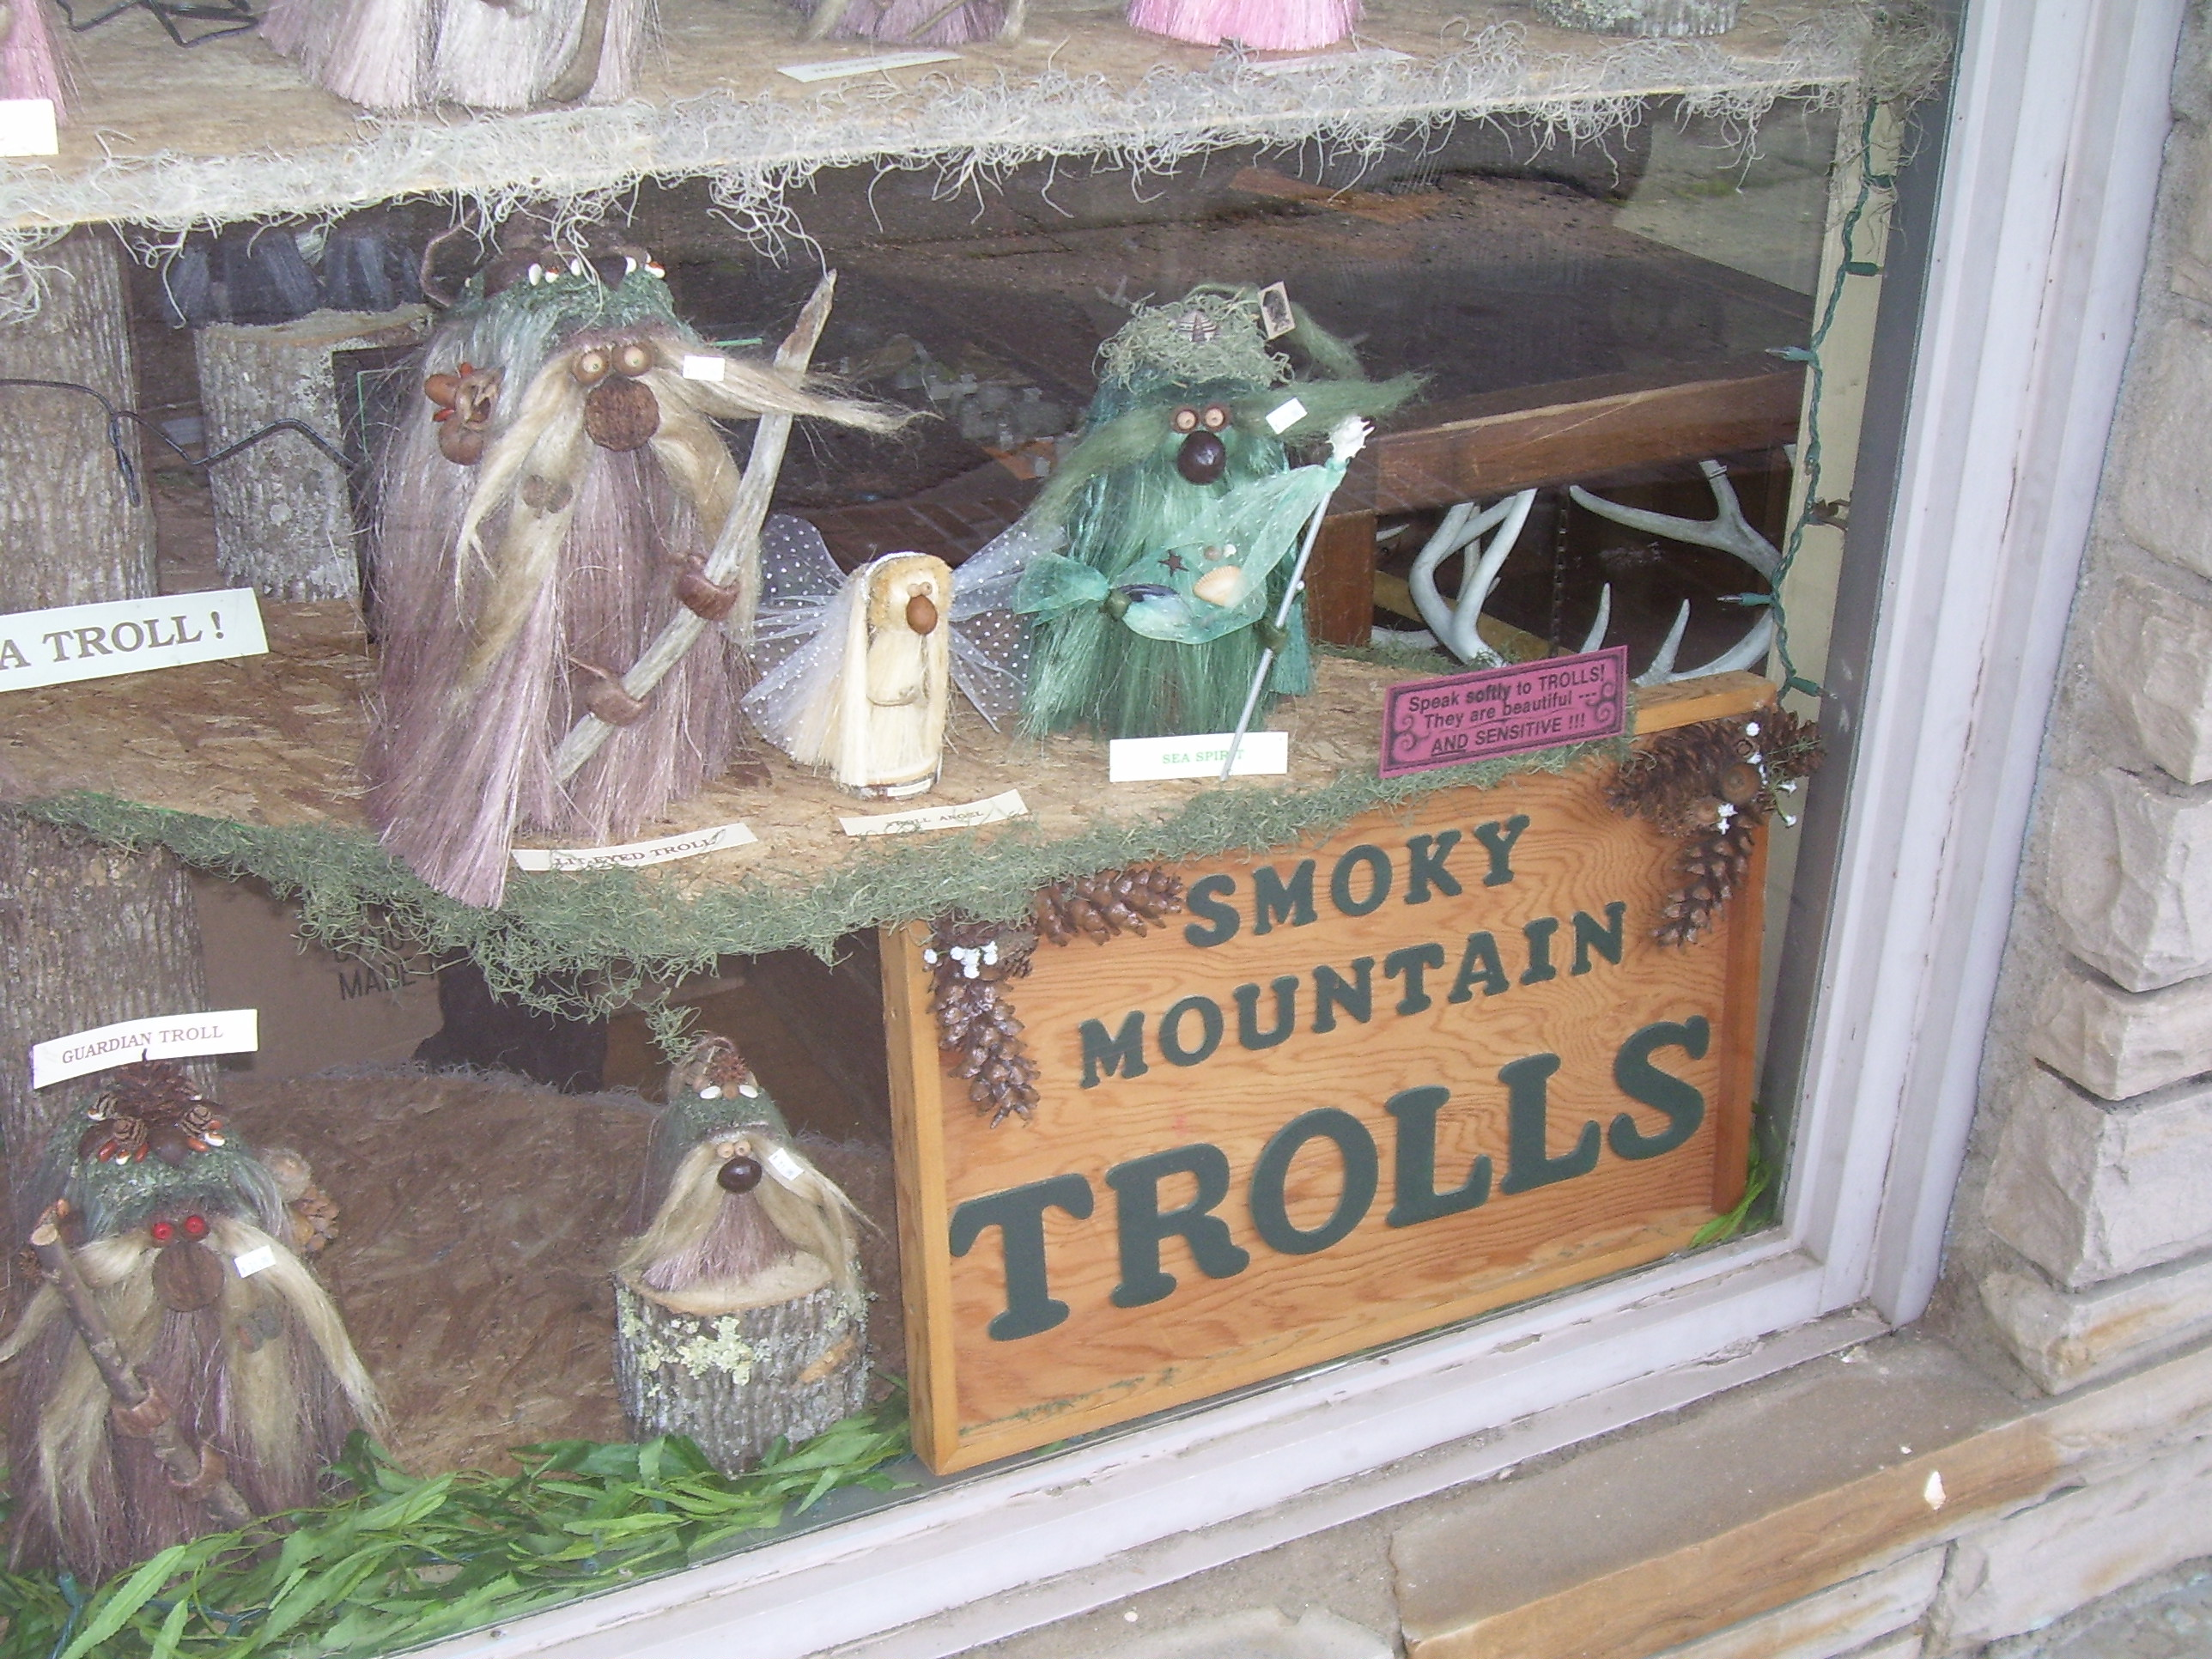 tennessee-cosby-trolls-window-display.jp